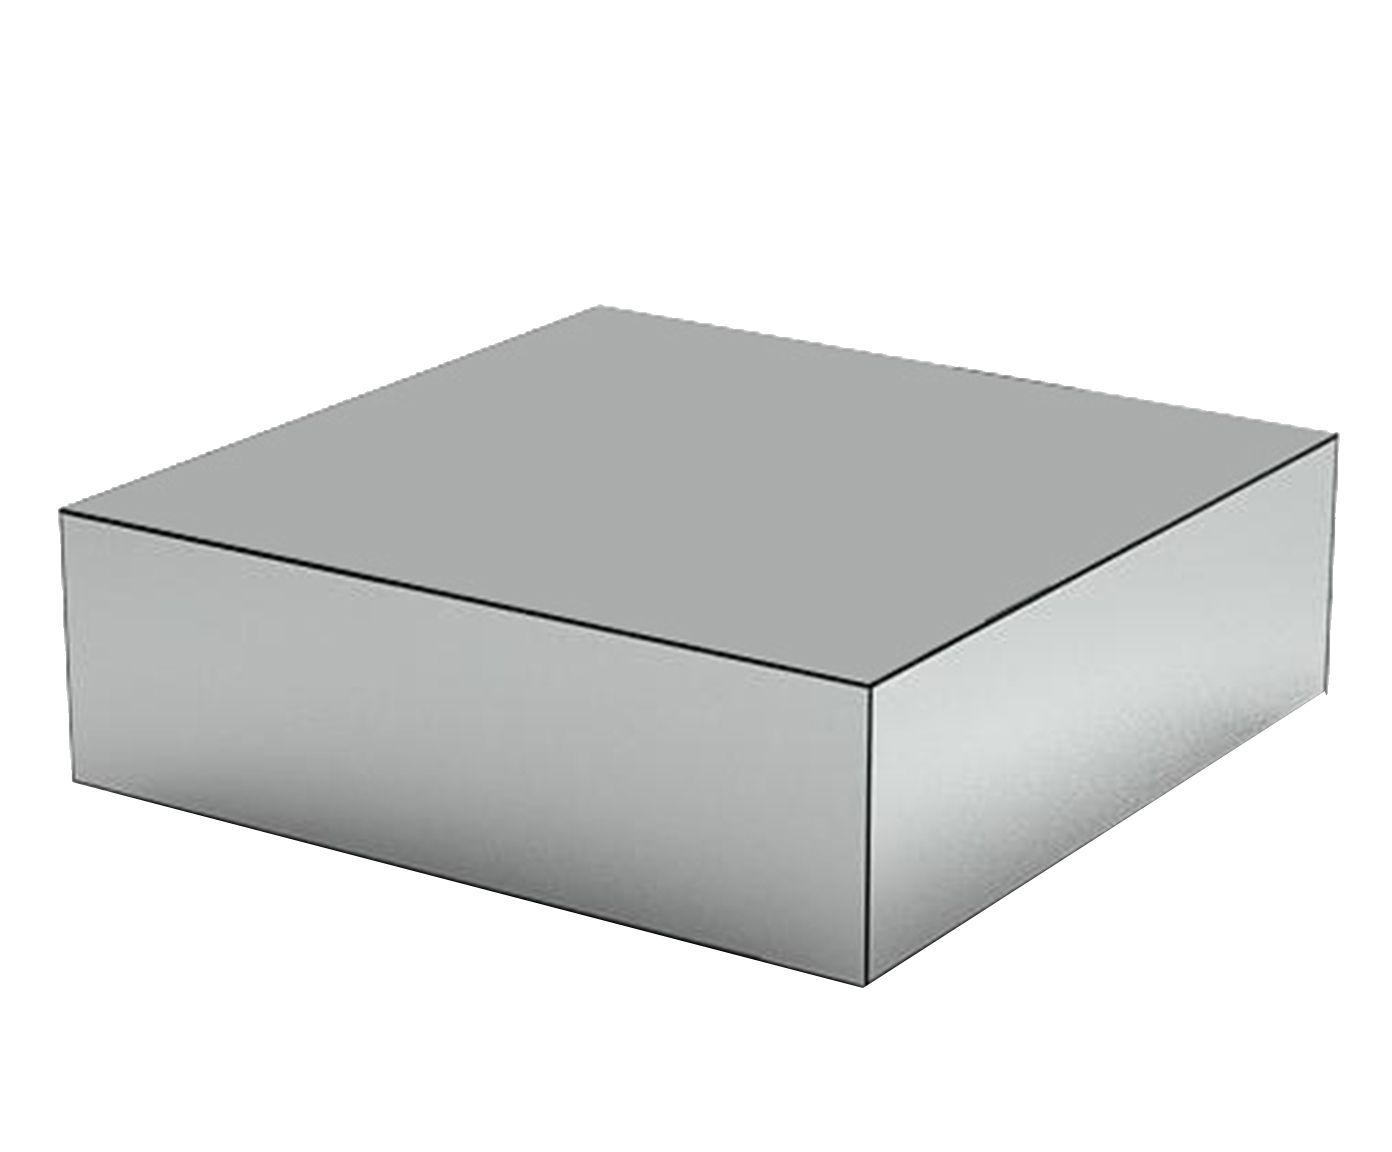 MESA DE CENTRO BOX - 80X35X80CM | Westwing.com.br